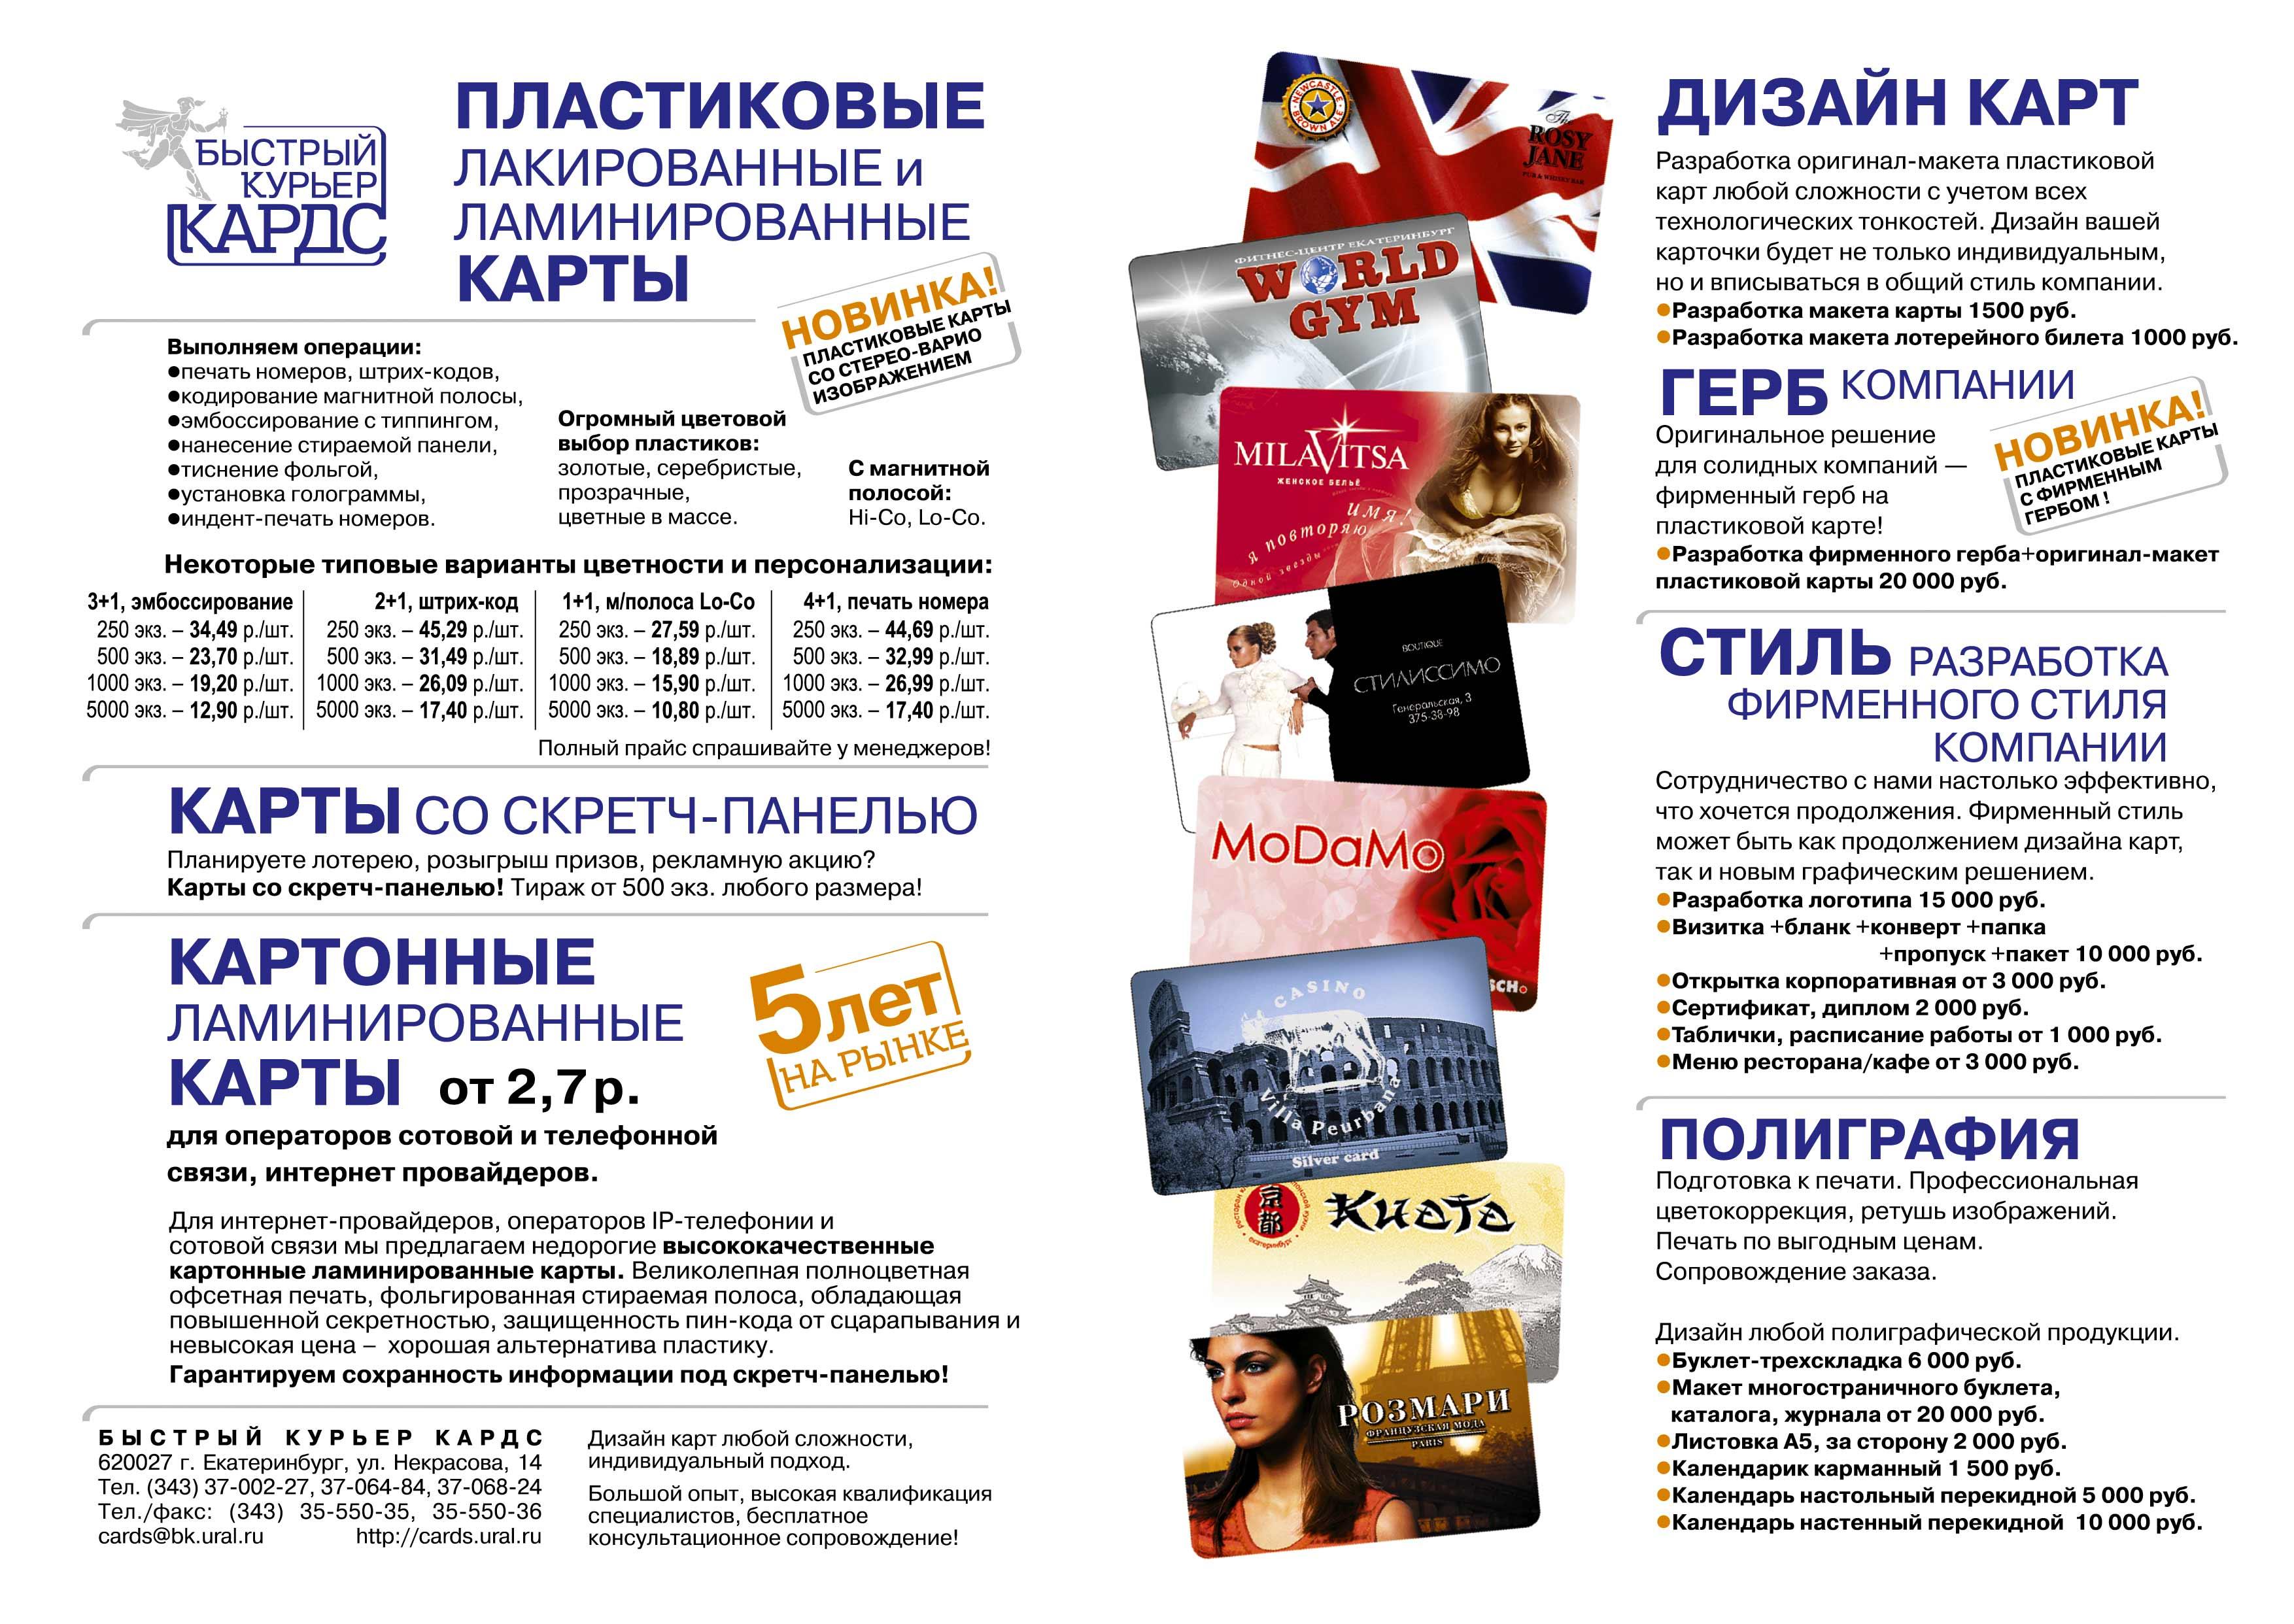 Visa gold цена Кимры